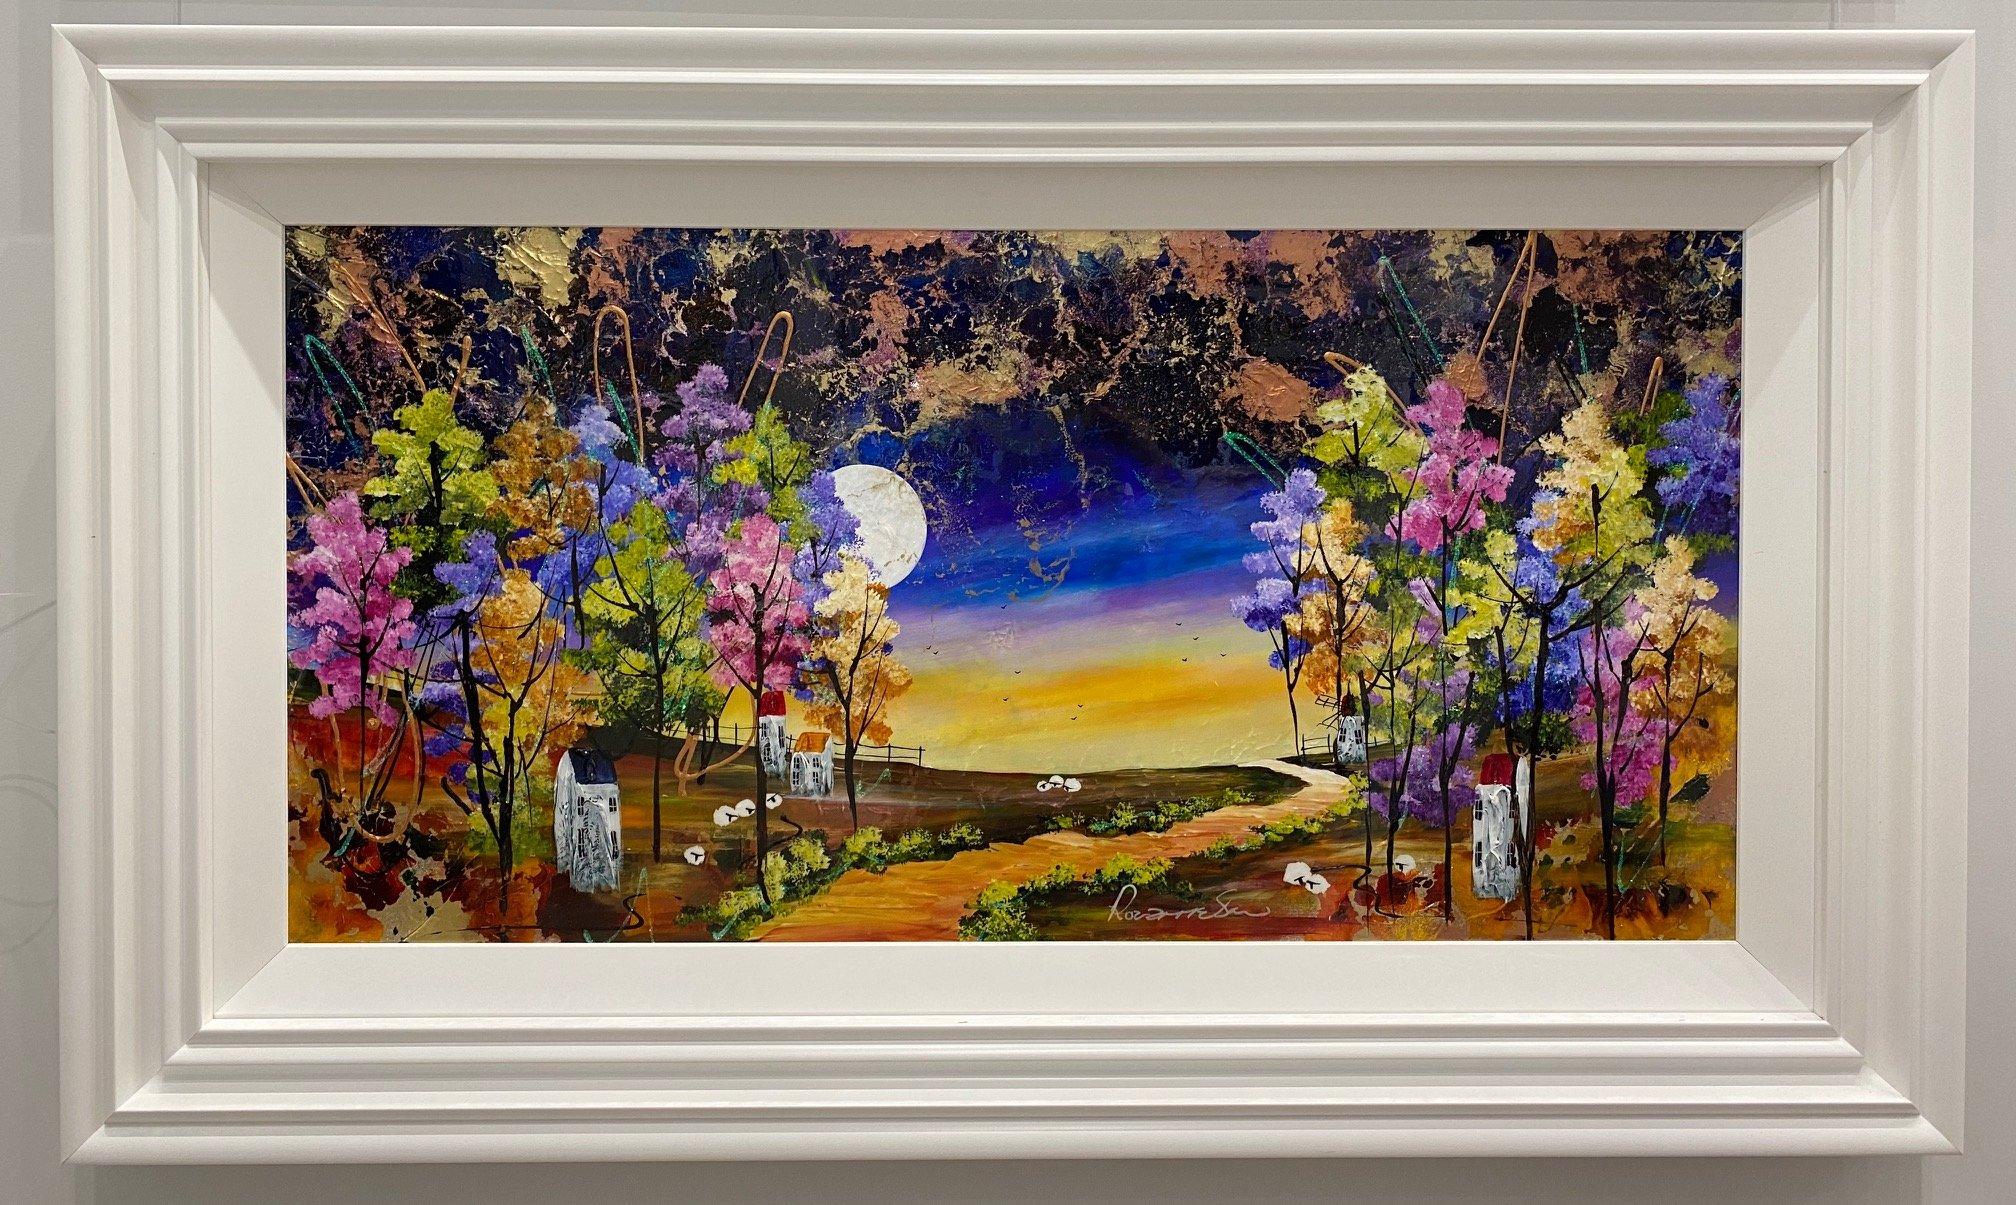 Harvest Moon III by Rozanne Bell